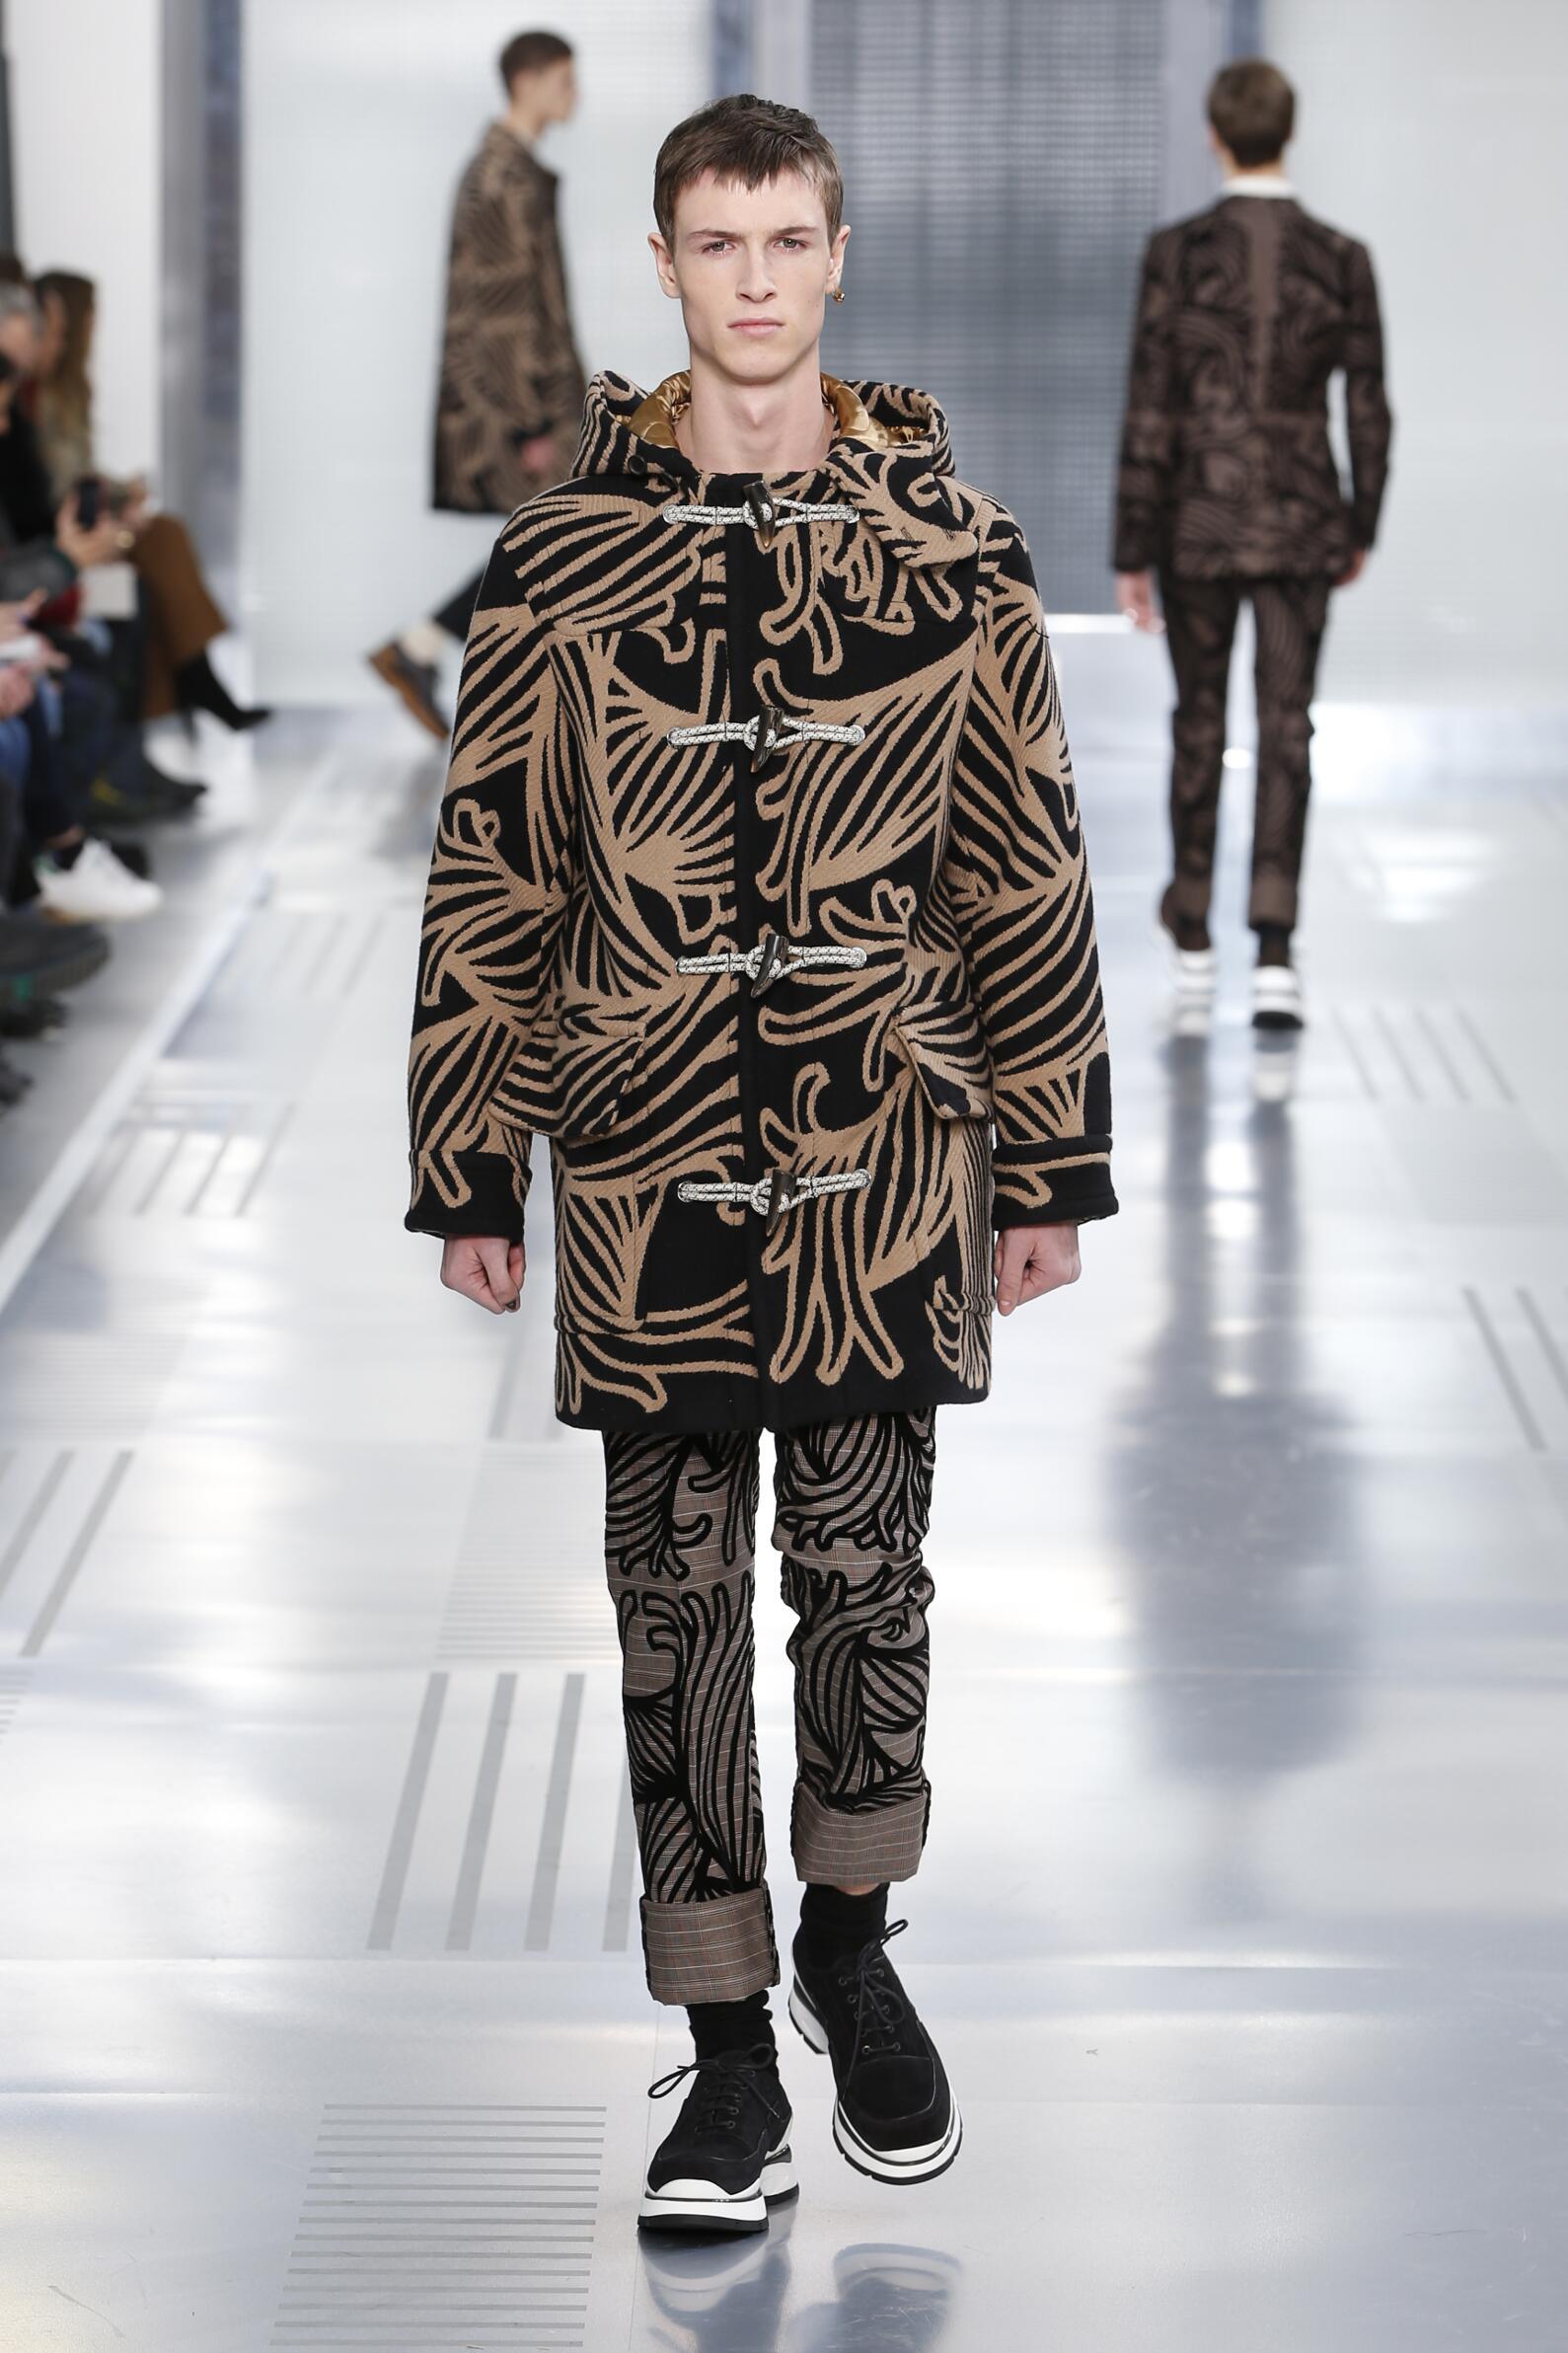 Fall Louis Vuitton Collection Fashion Man Model